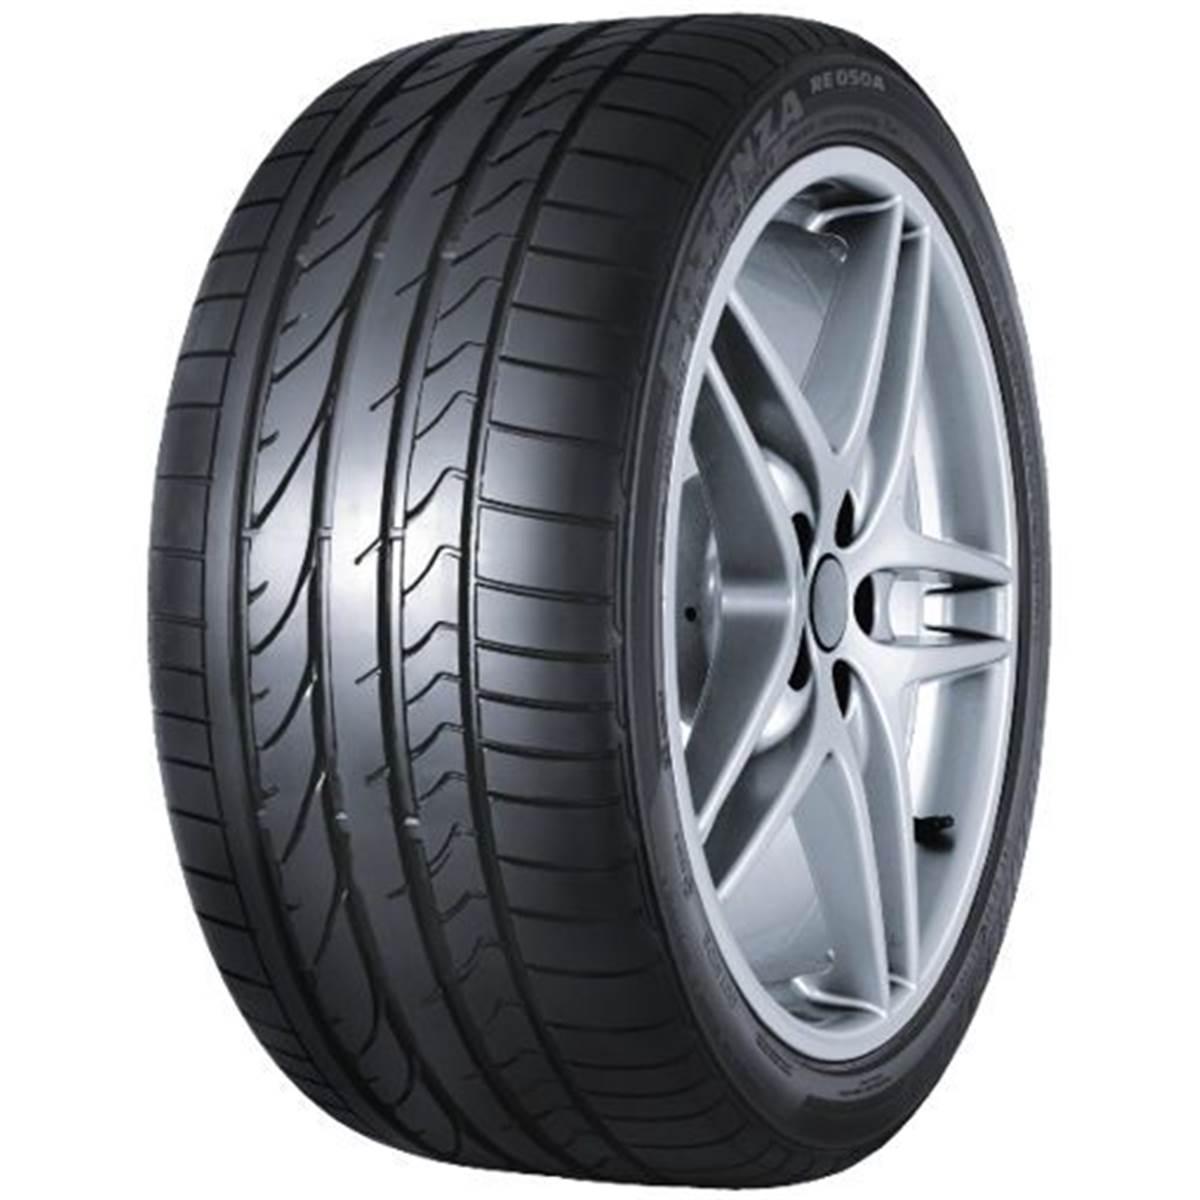 Pneu Bridgestone 215/50R17 91W Potenza Re050A